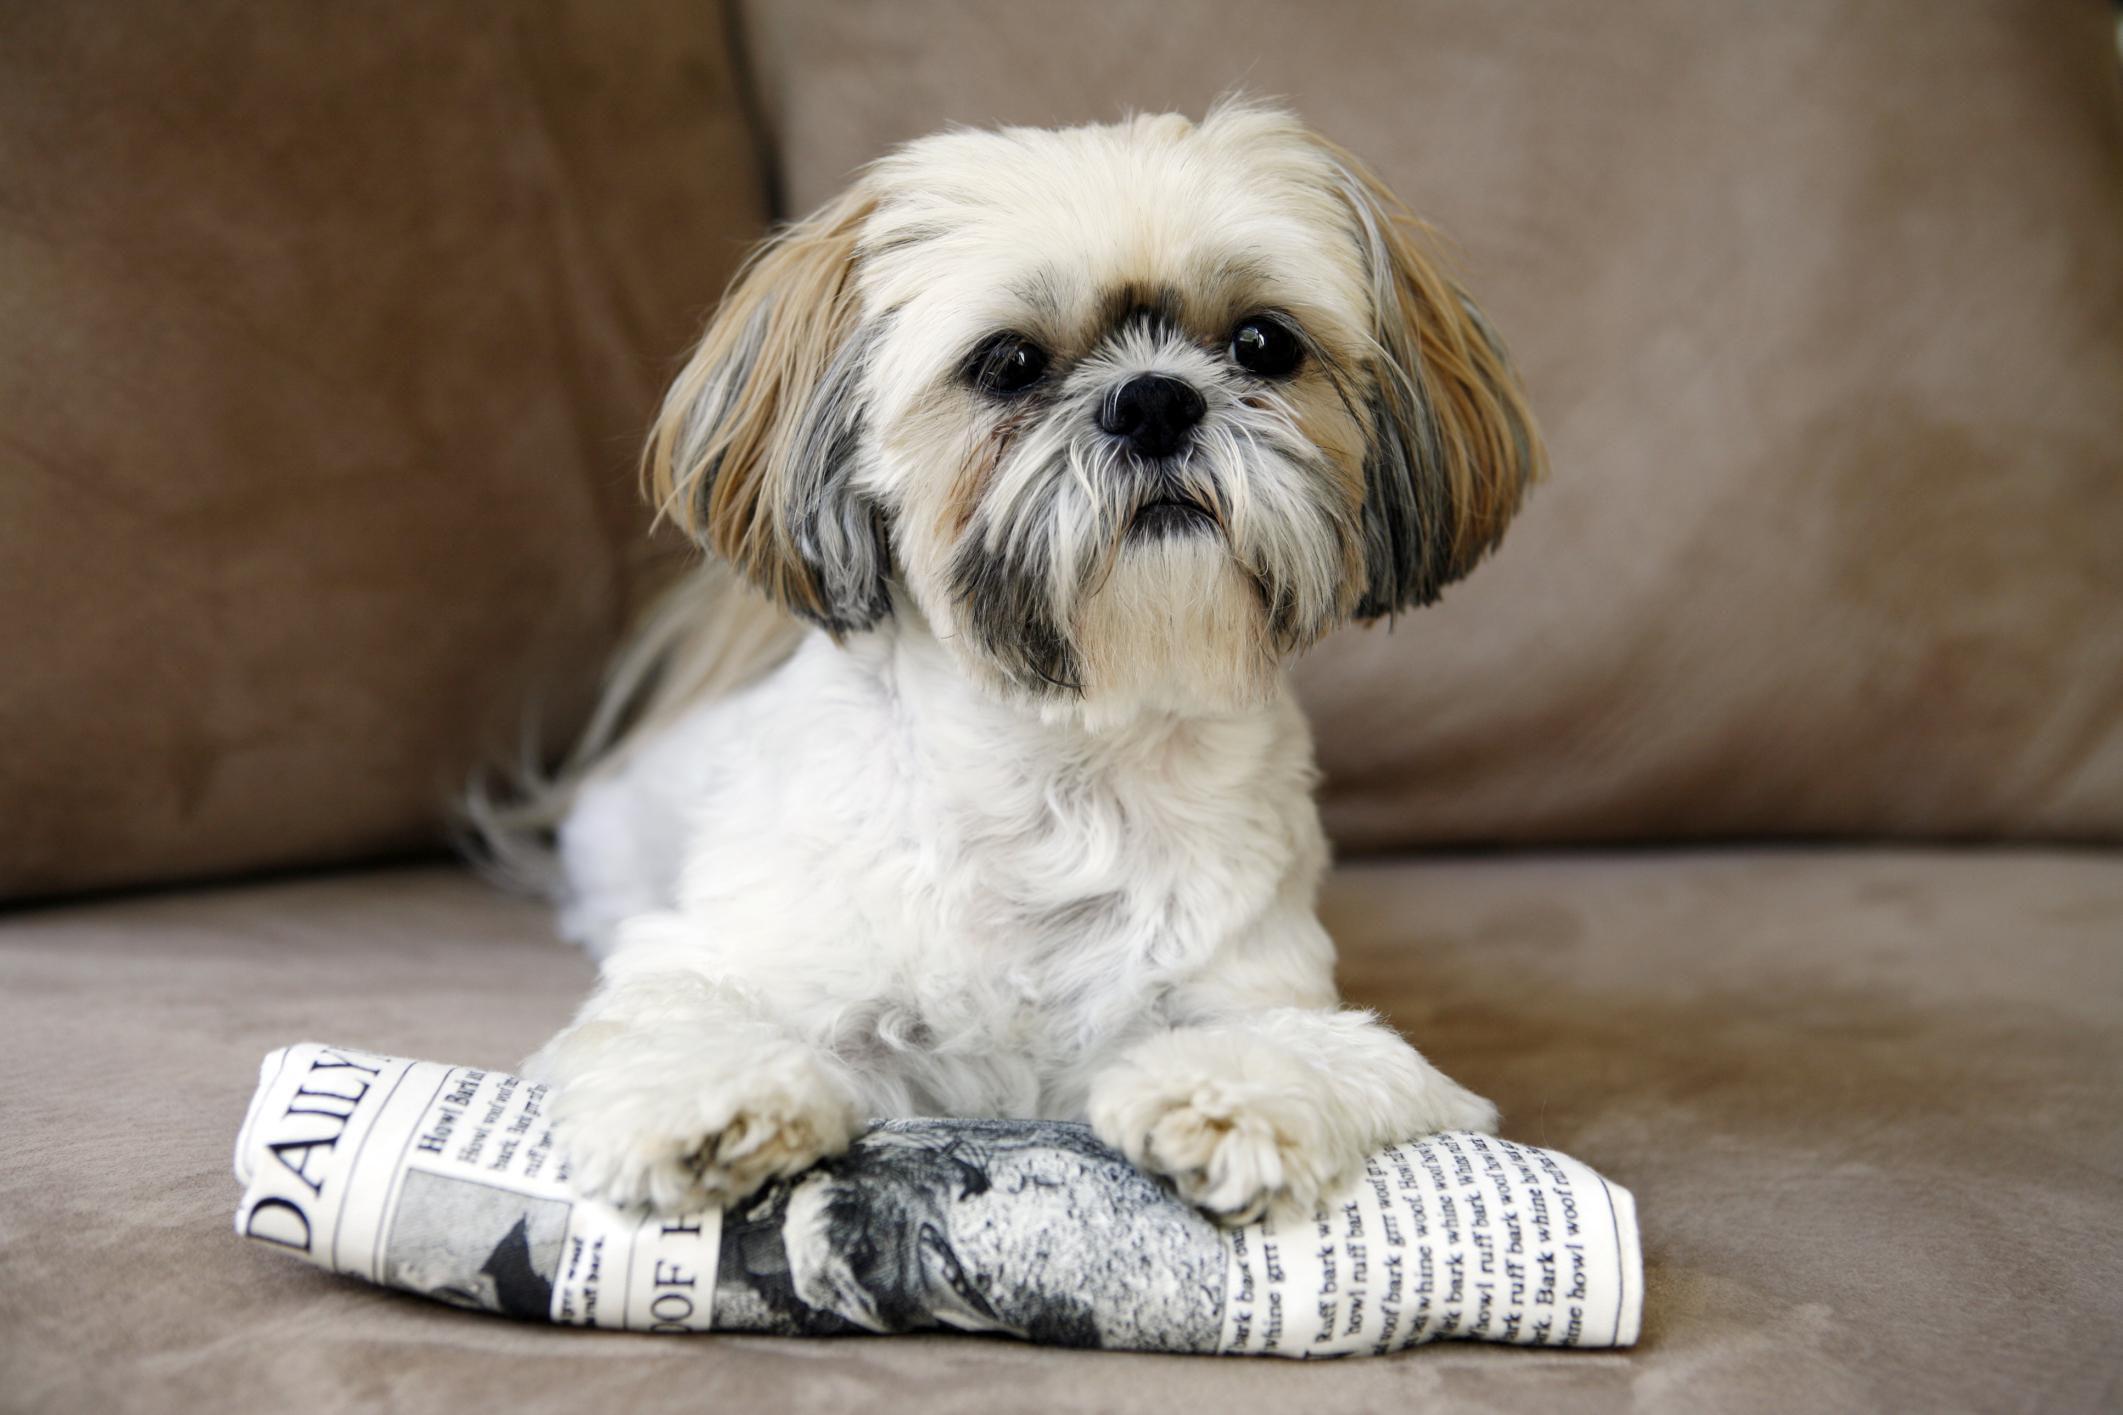 Shih Tzu: Dog Breed Profile